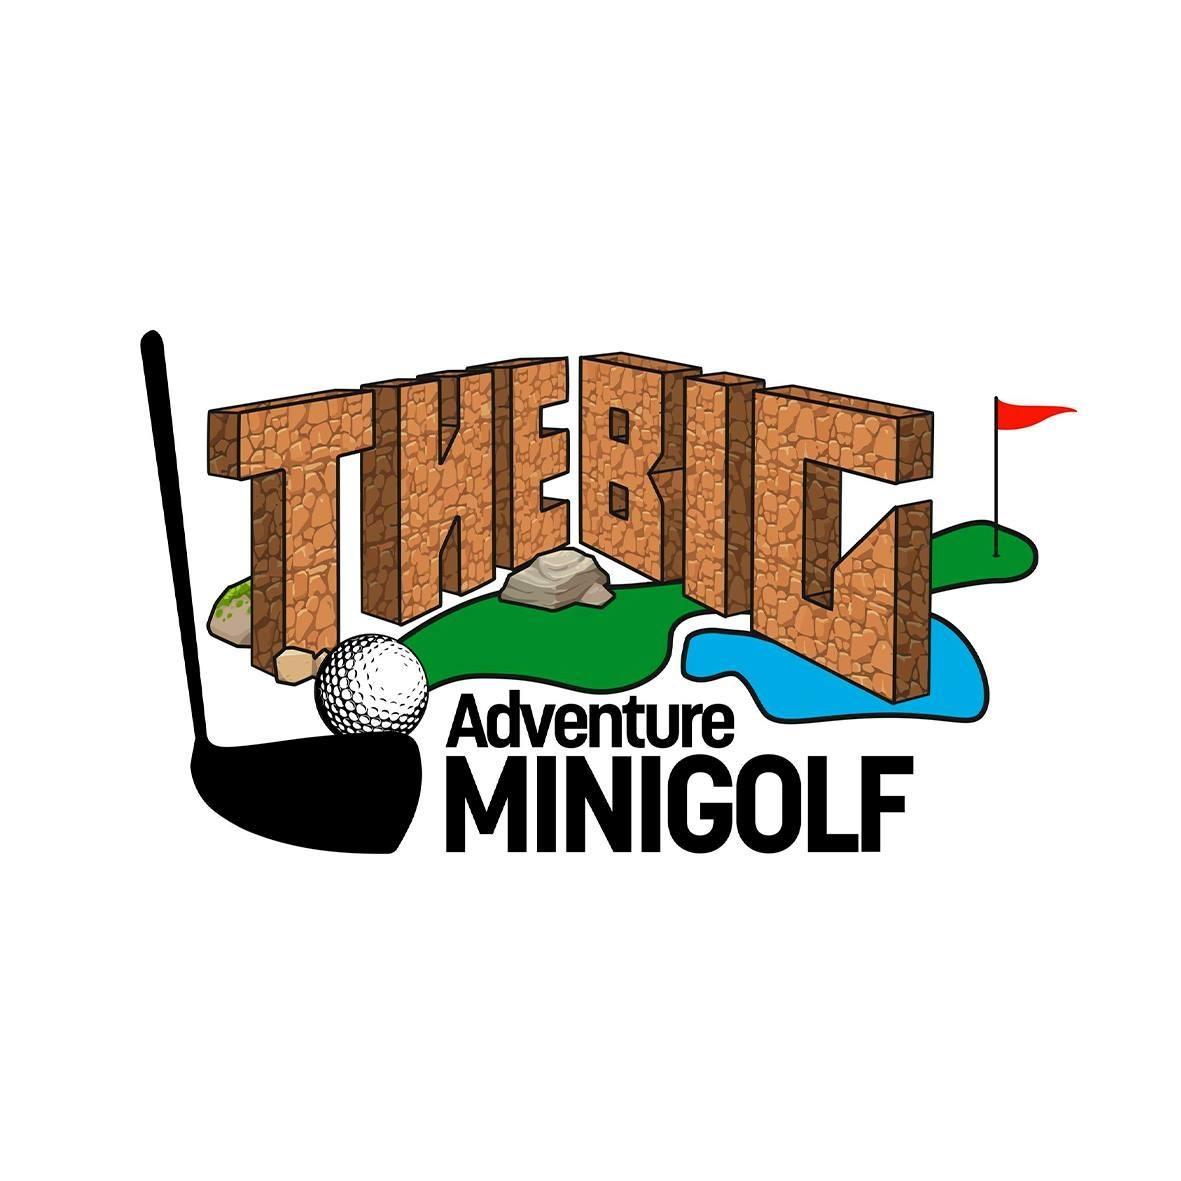 THE BIG ADVENTURE MINIGOLF